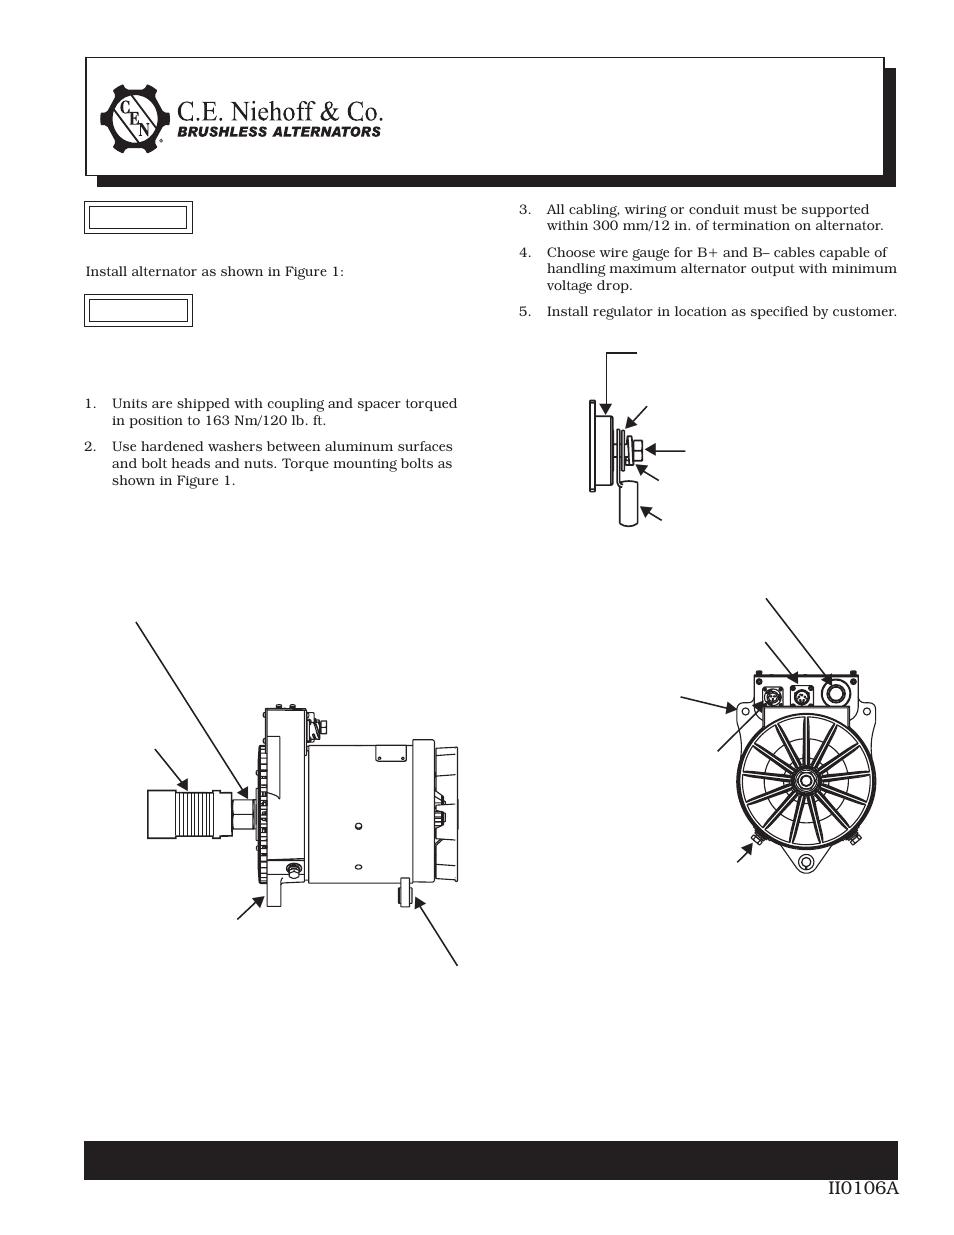 C E  Niehoff & Co  N1385-2 Alternator Installation User